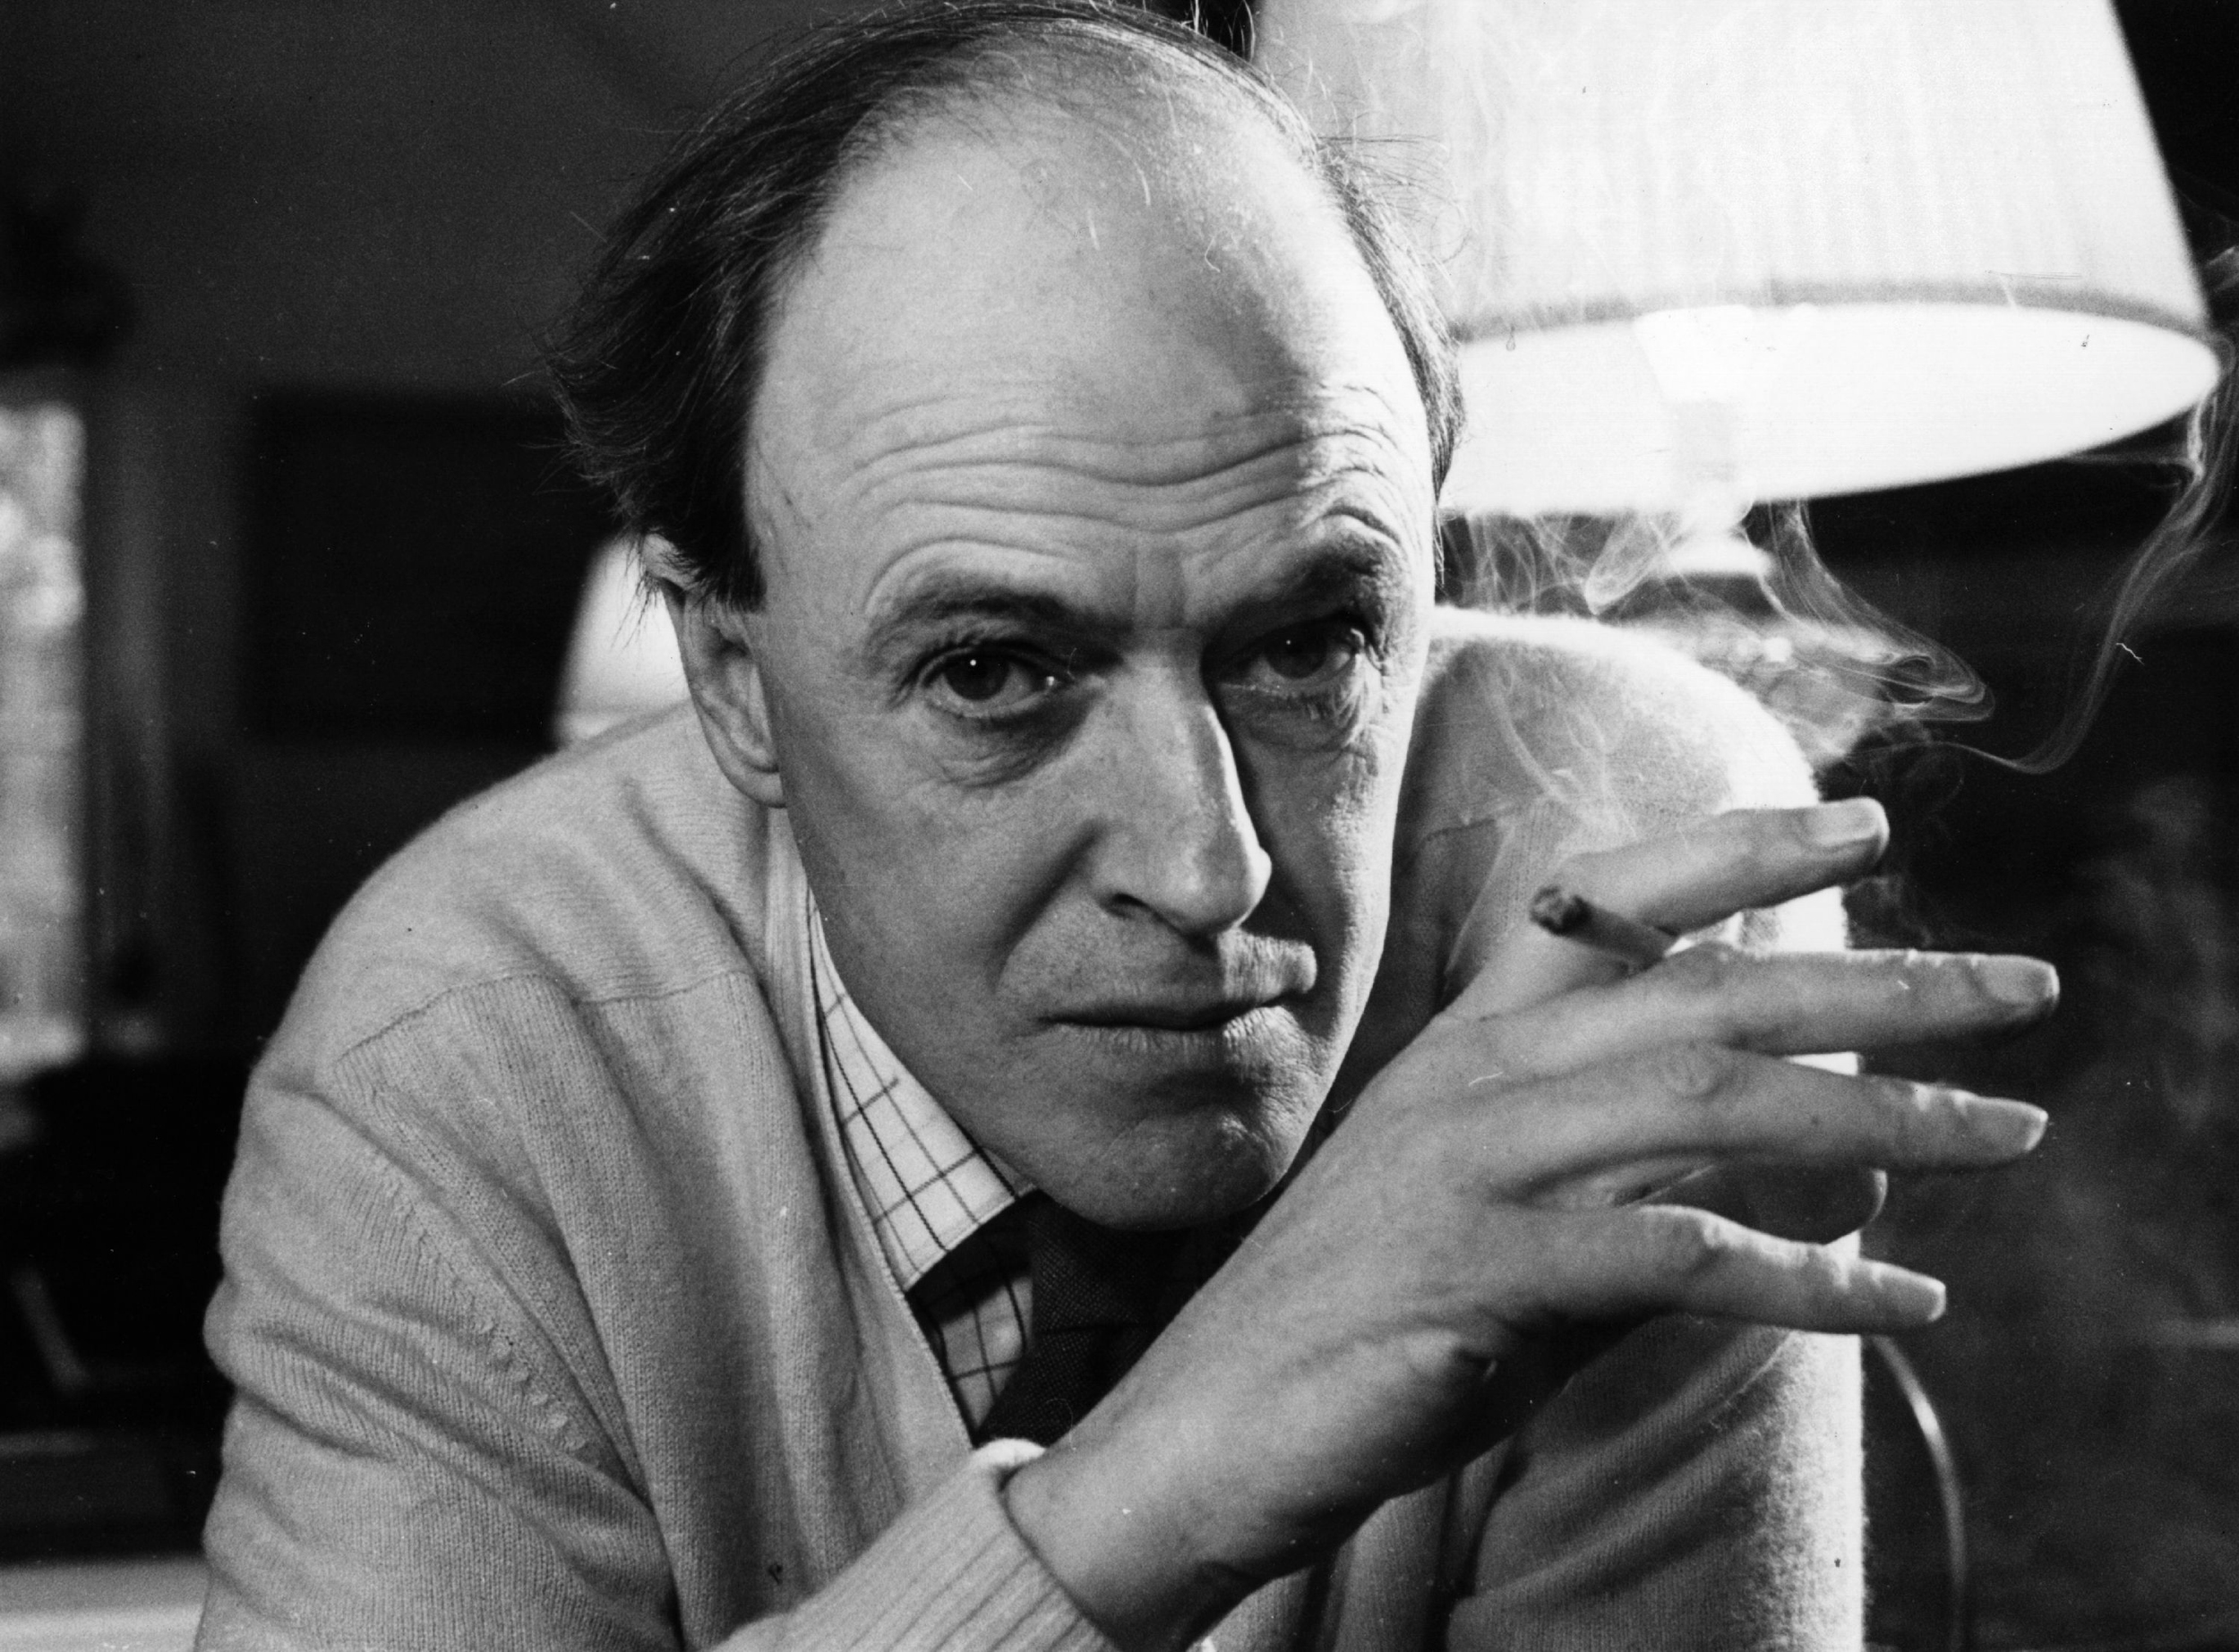 Matilda, Willy Wonka join Netflix as it buys Roald Dahl's works